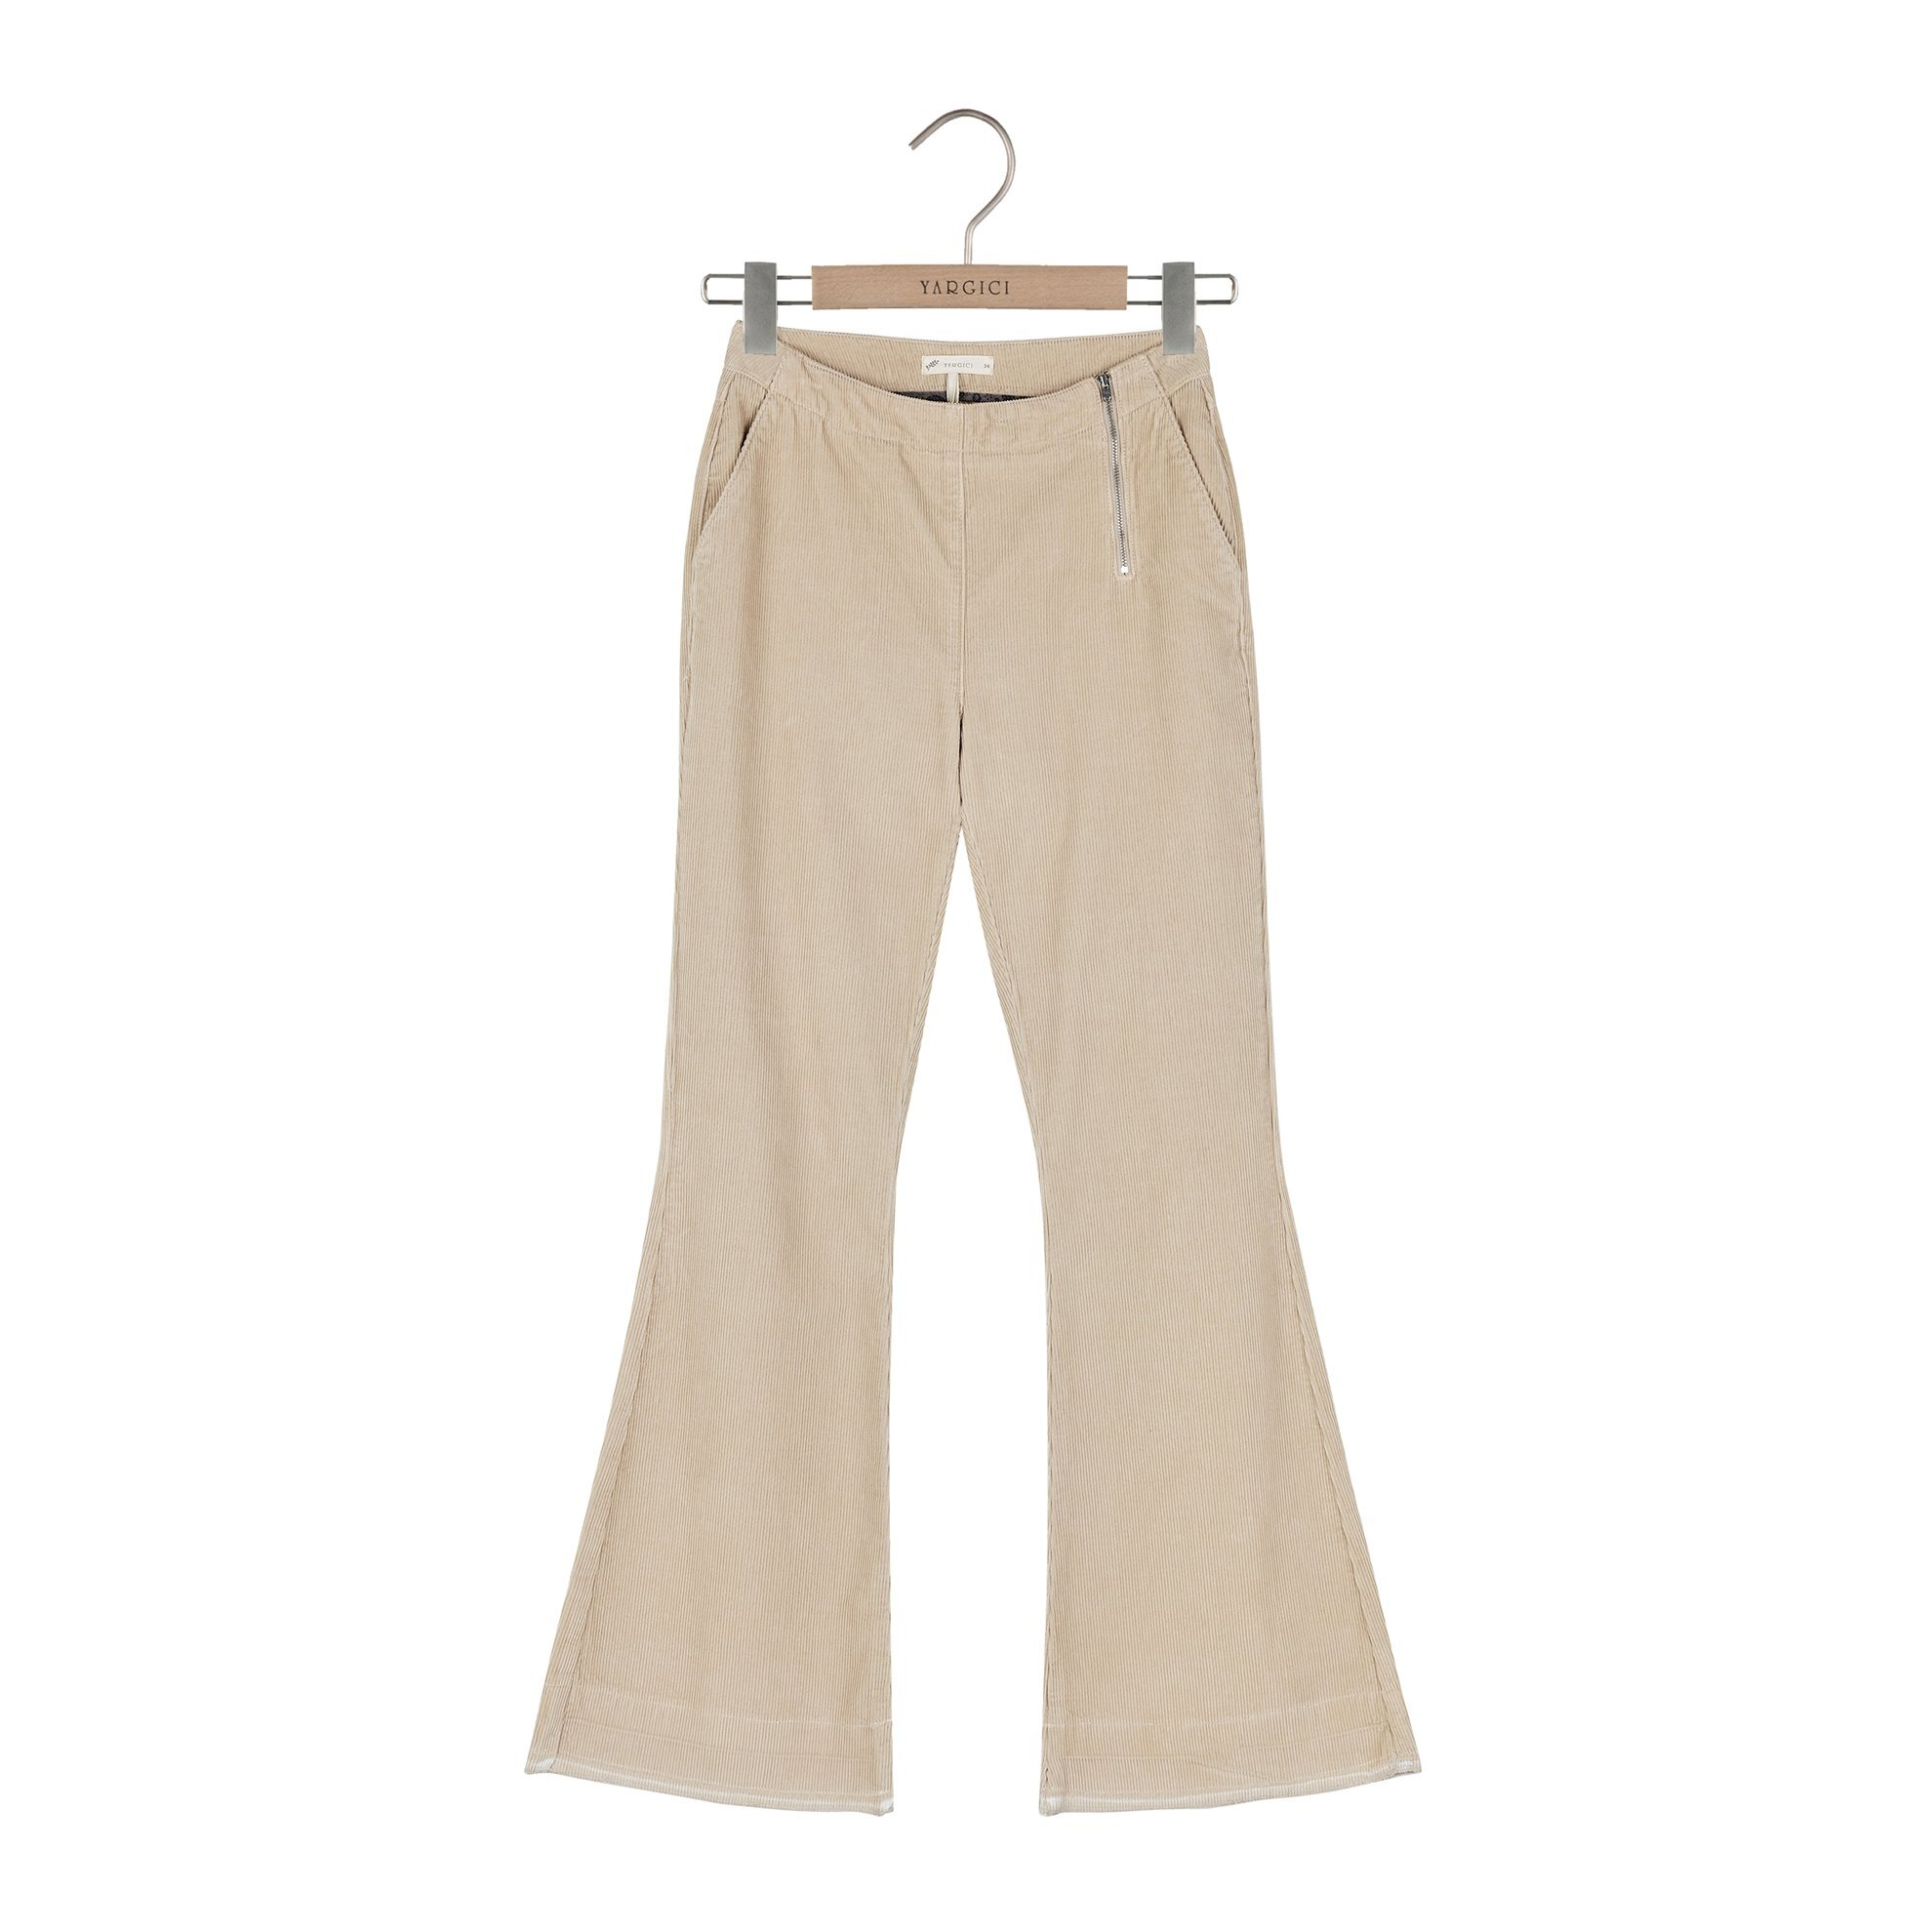 Damen Hose aus Samt